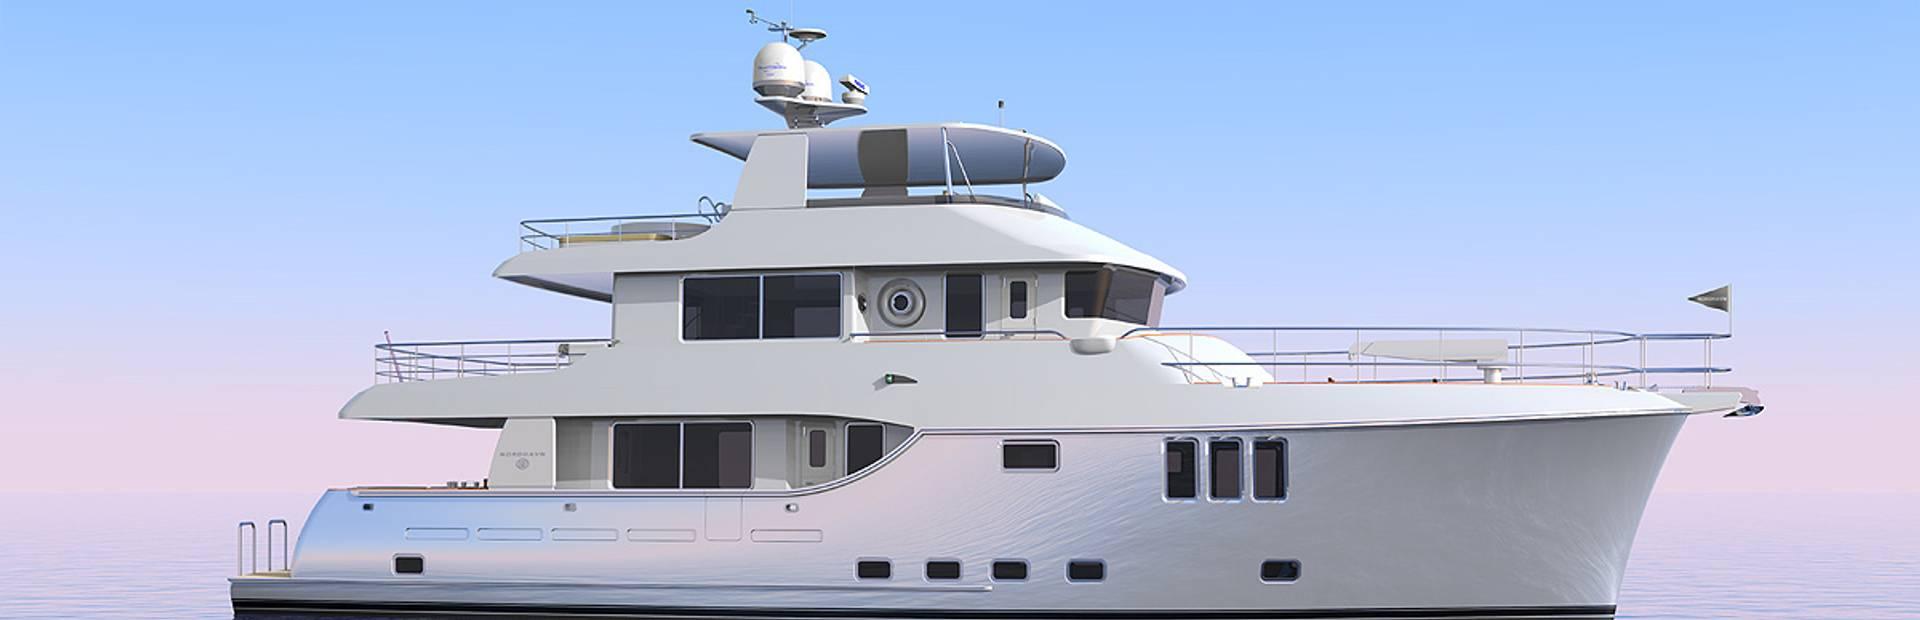 Nordhavn 80 Yacht Charter